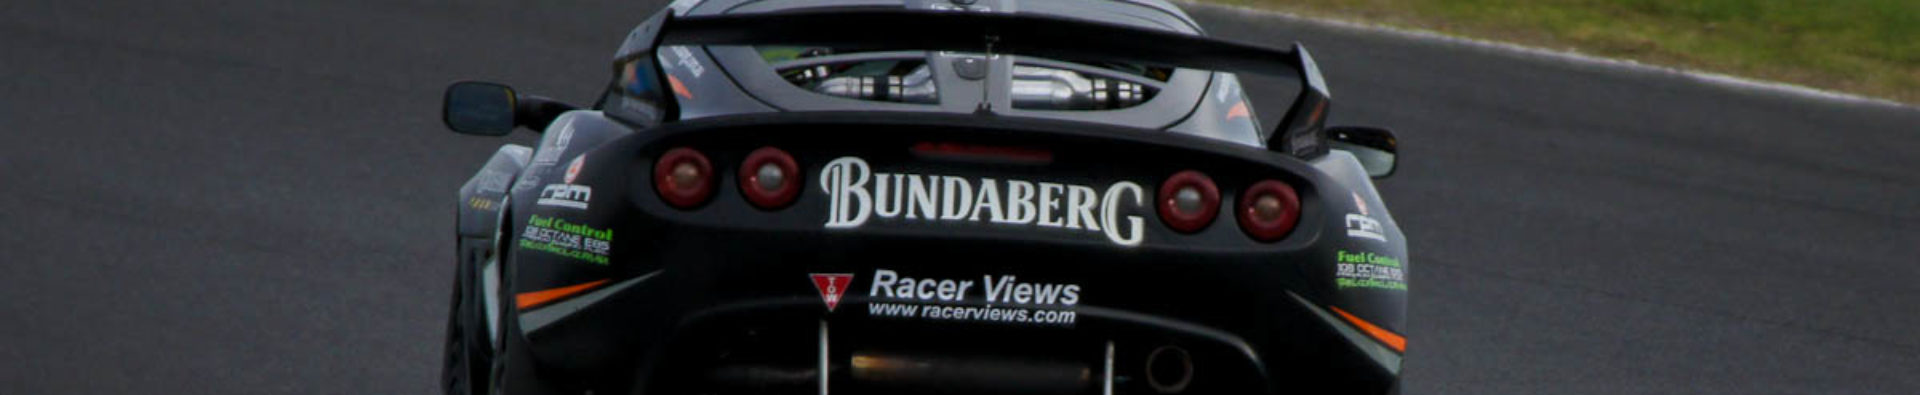 RacerViews.com